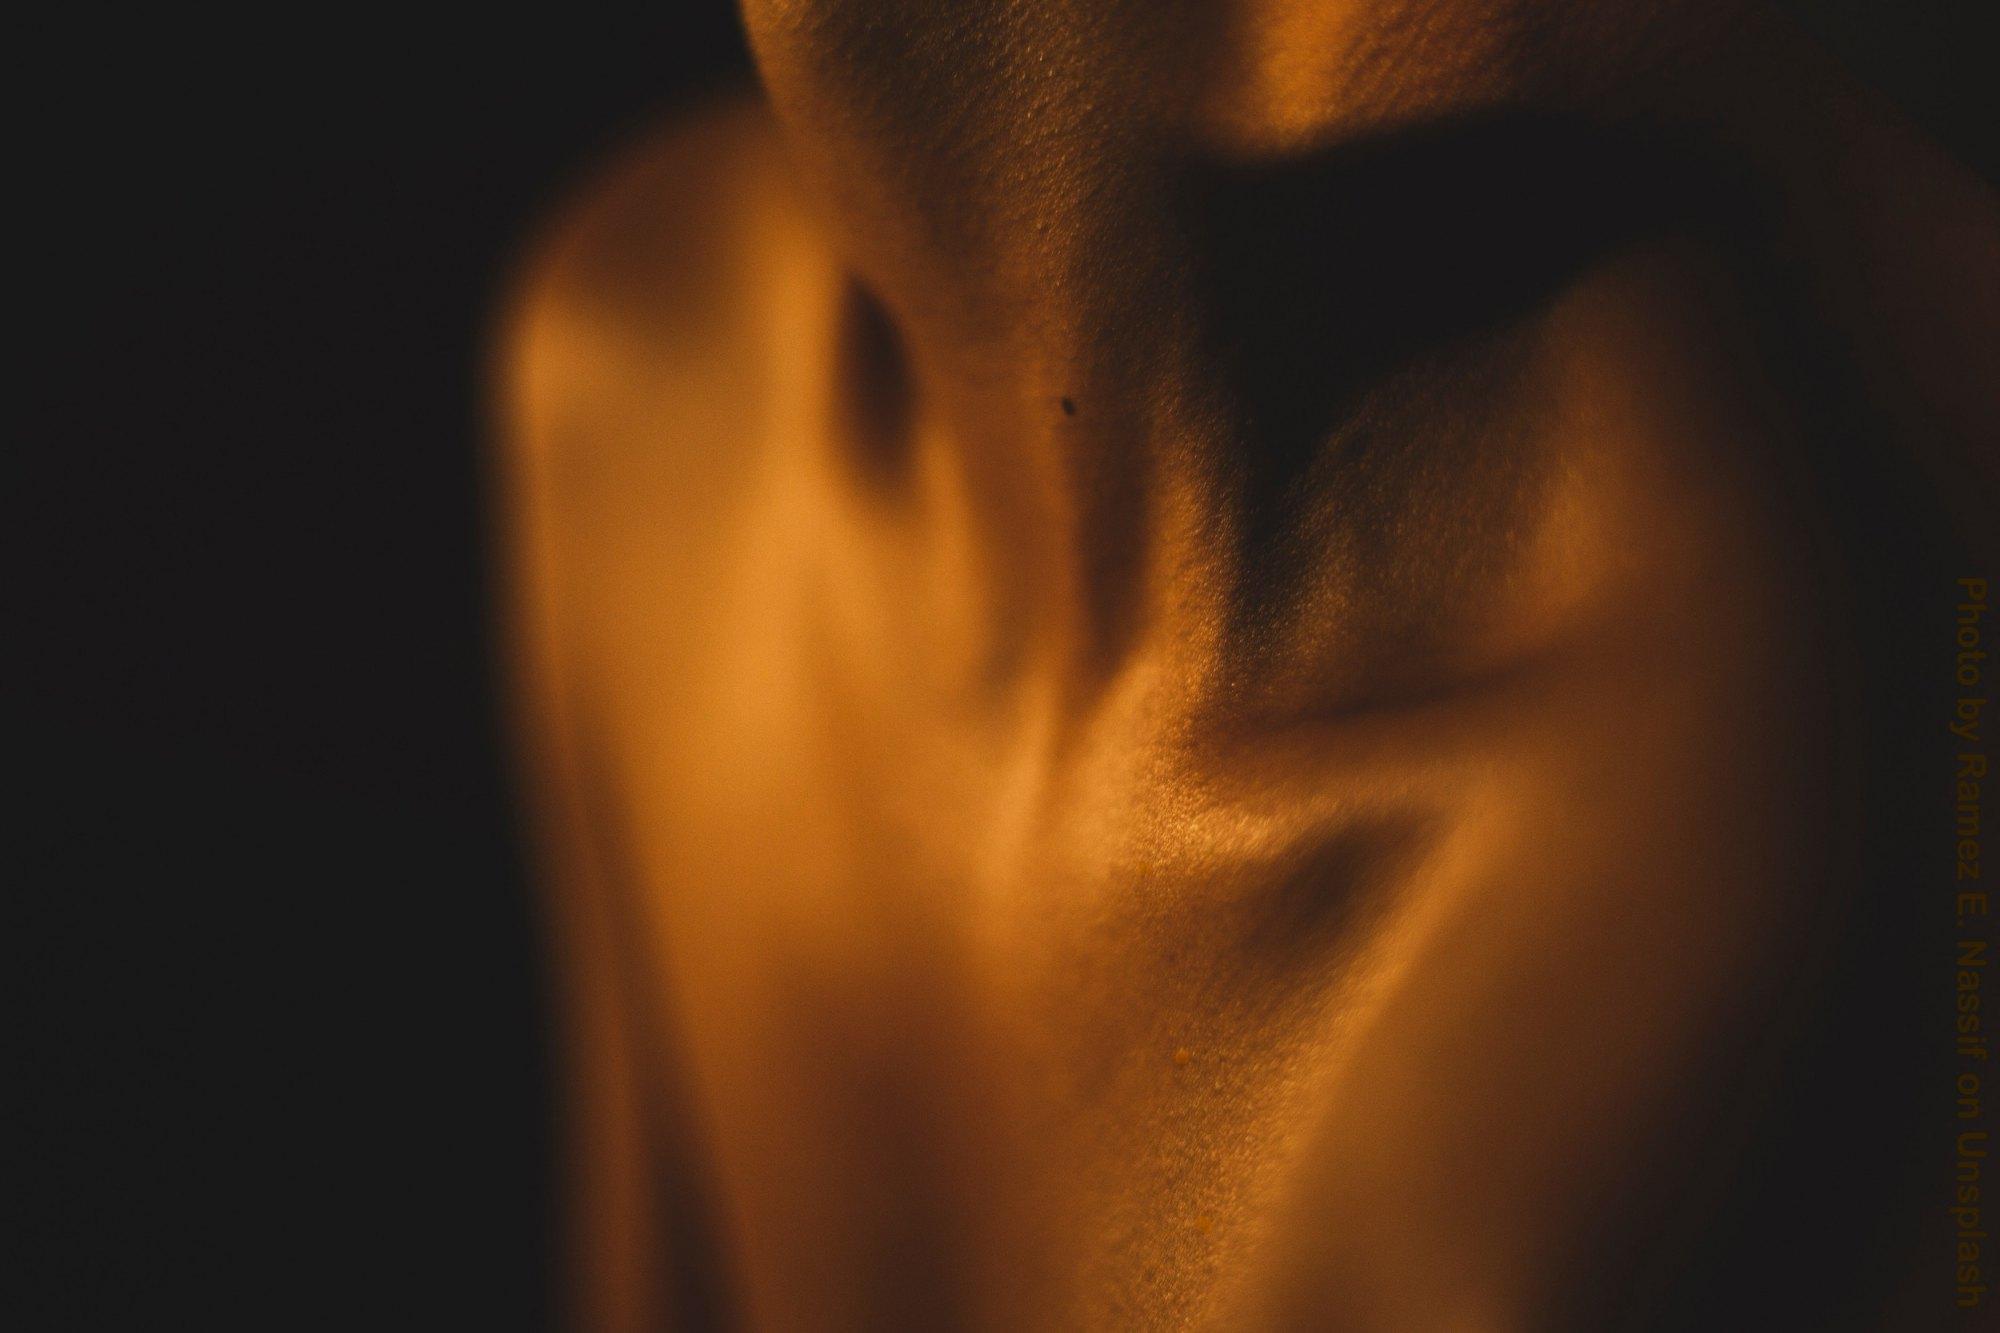 6 the lovers, tarot, shamanism, mayan, daykeeper, men, abundance, achieve, envision, focus, insight, intuition, prosperity, HEALINGthroughCEREMONY.com, Michele Fire-River Heart